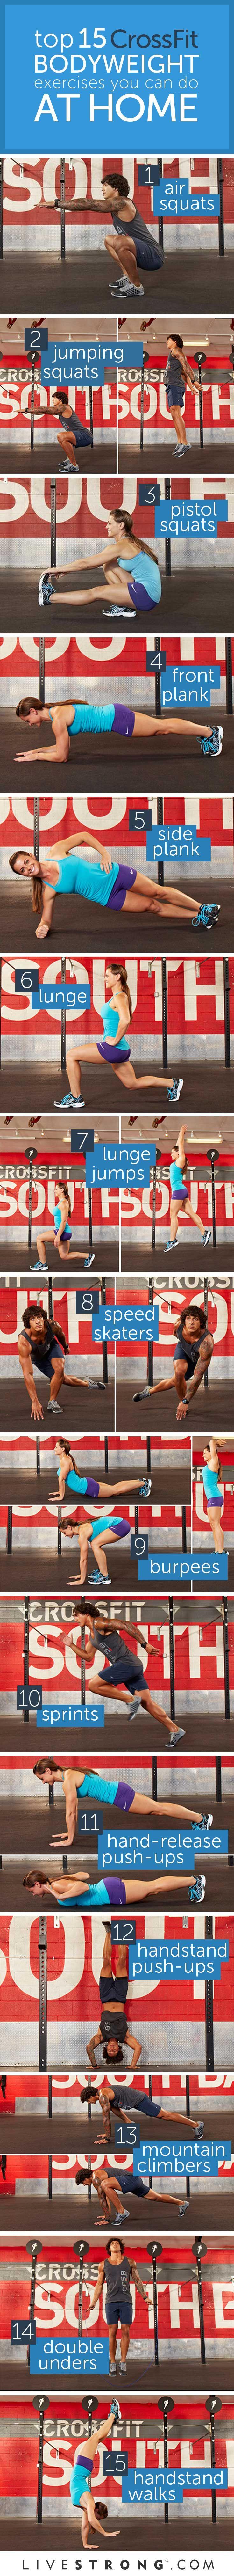 25 mejores im 225 genes de architecture vegetation en pinterest - Crossfit Body Body Weight Exercises Crossfit Inspiration Exercise Workouts Sport Spartan Race Trx Conditioning At Home